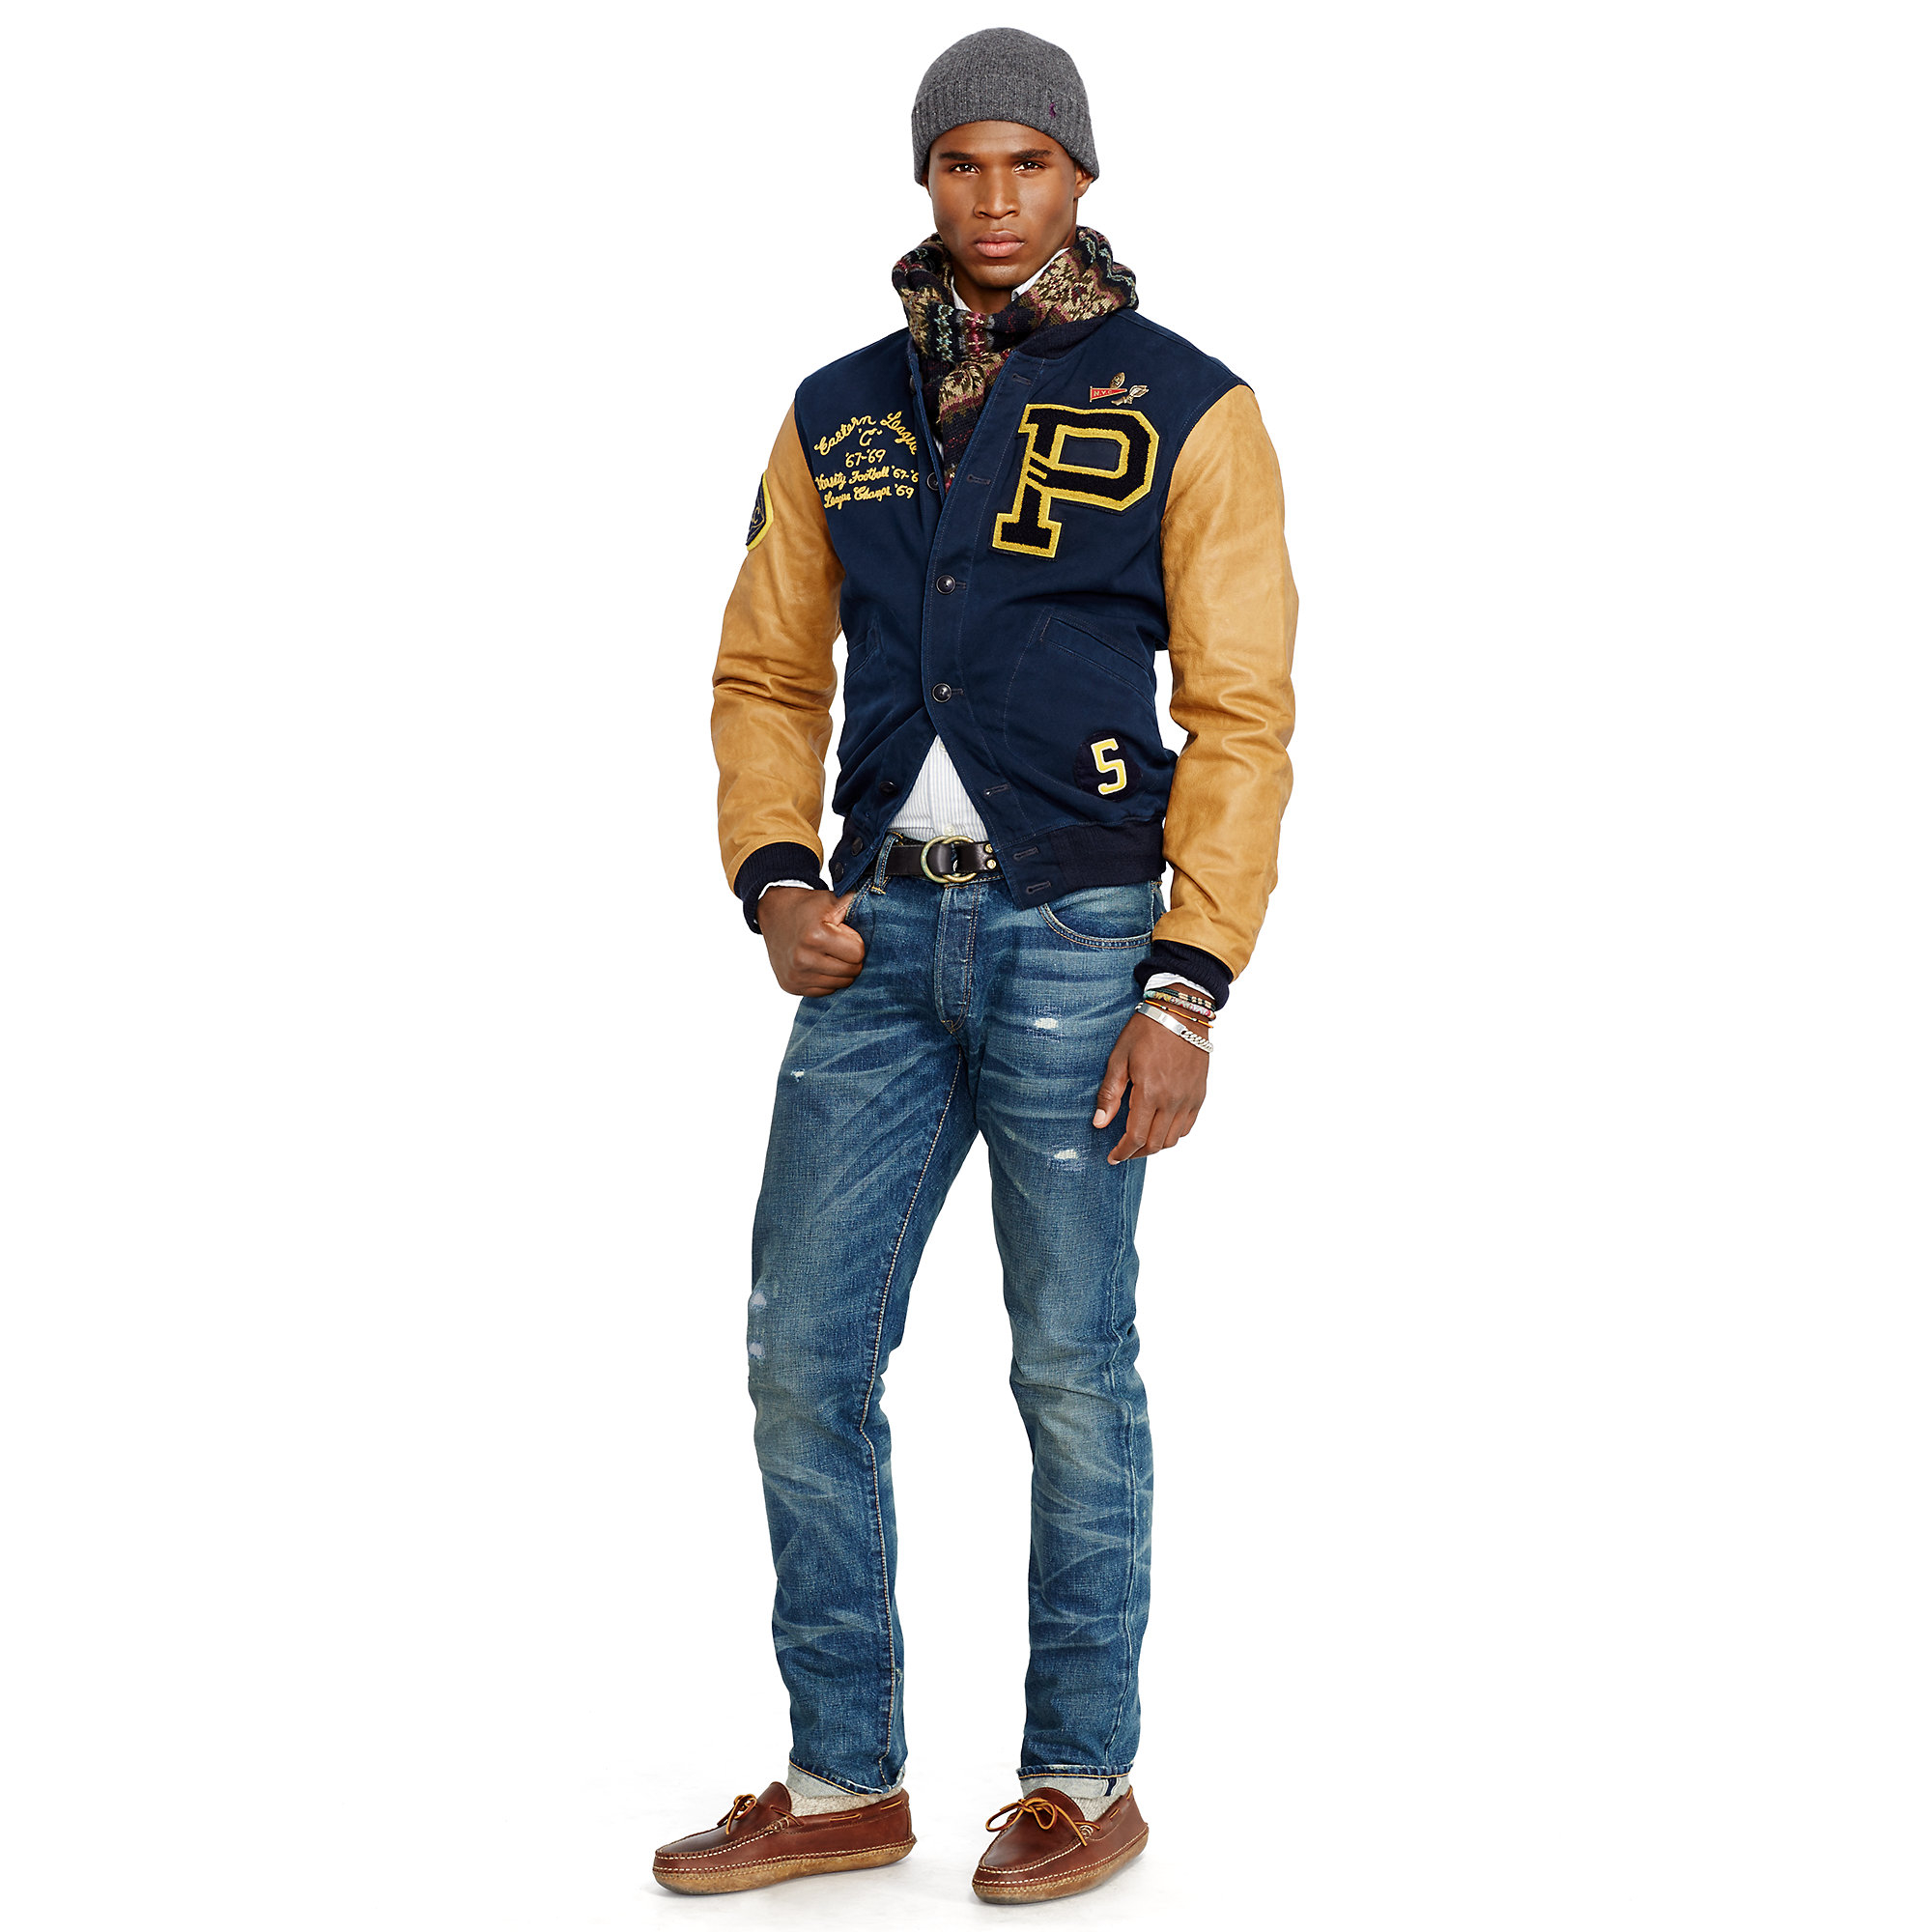 775e8a41ee8b Lyst - Polo Ralph Lauren Davidson Varsity Jacket in Blue for Men